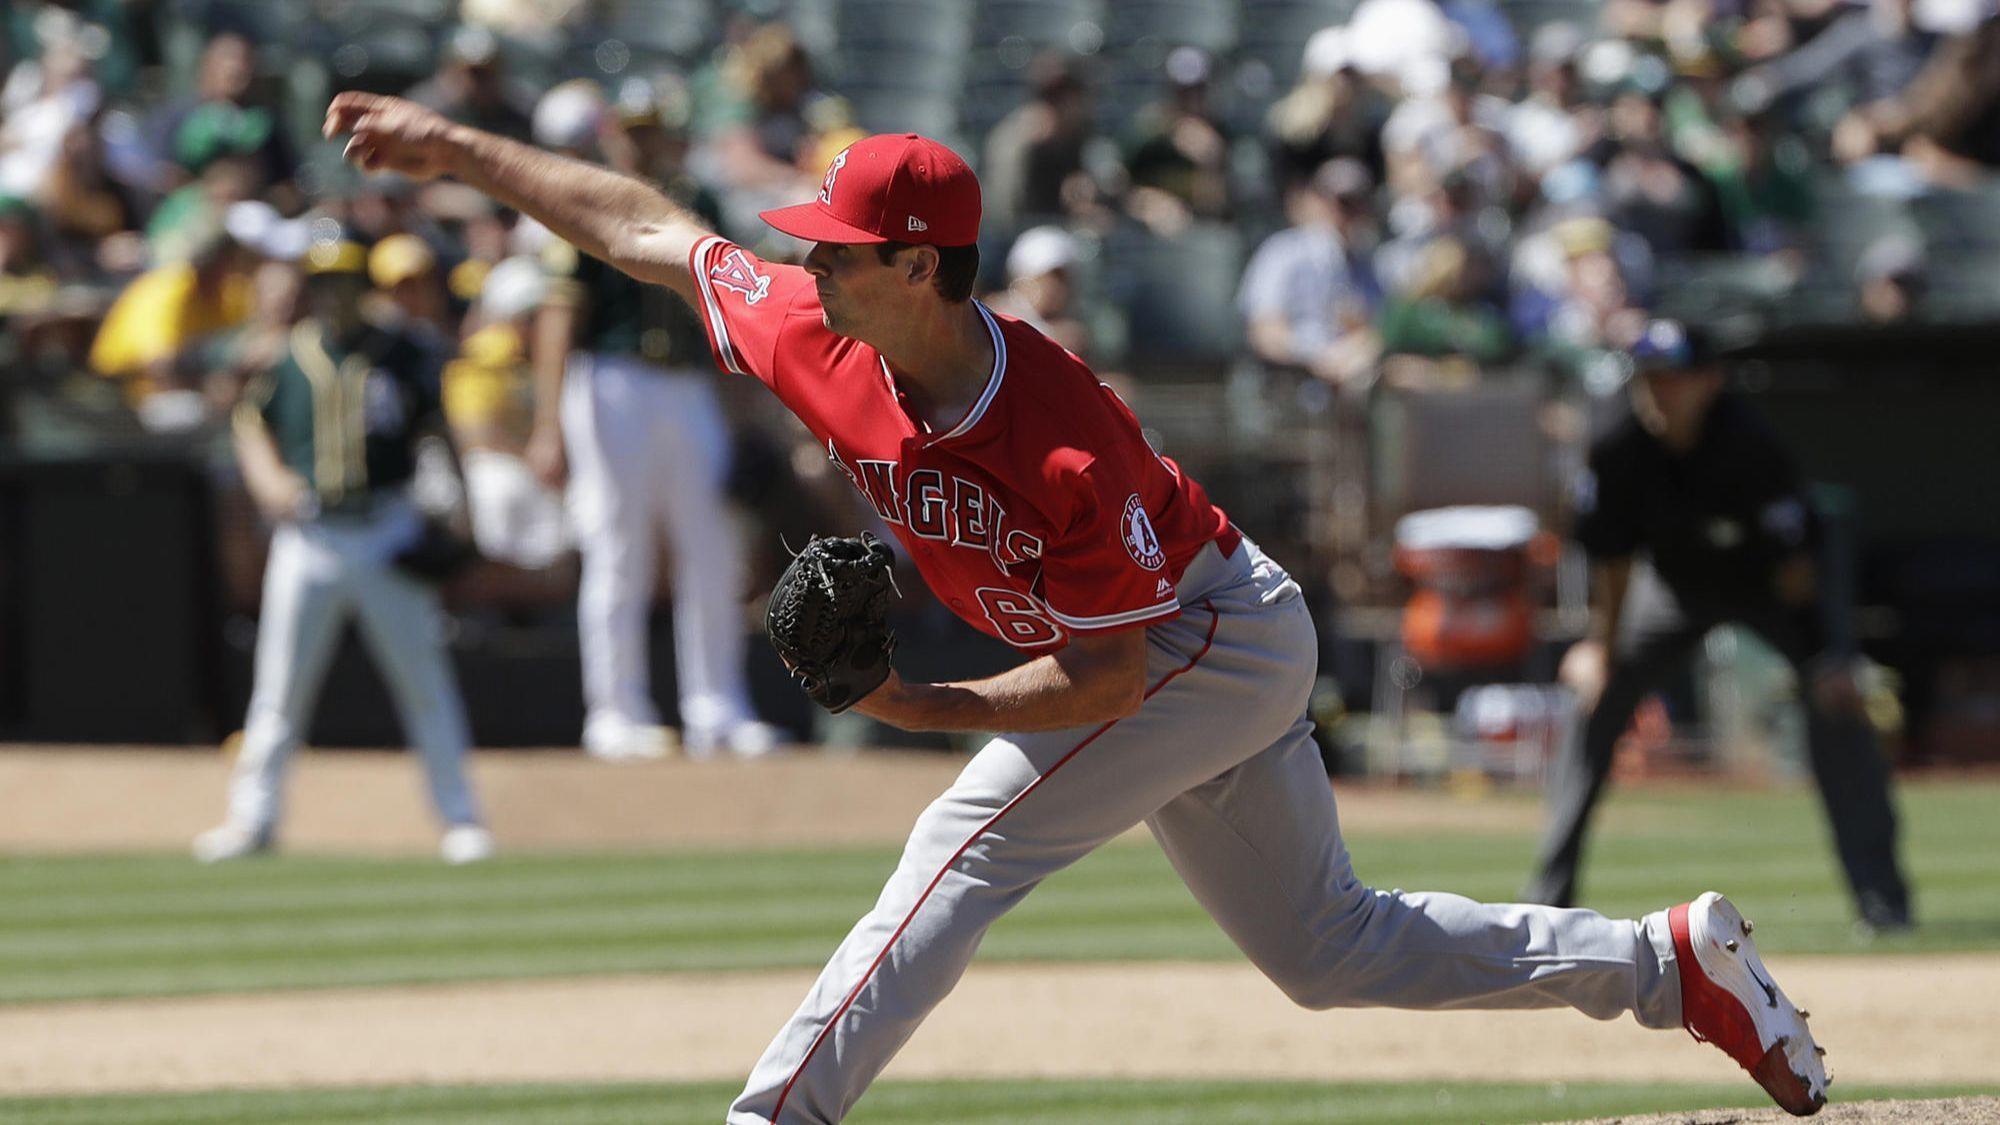 Angels pitcher Jake Jewell savoring his big moment